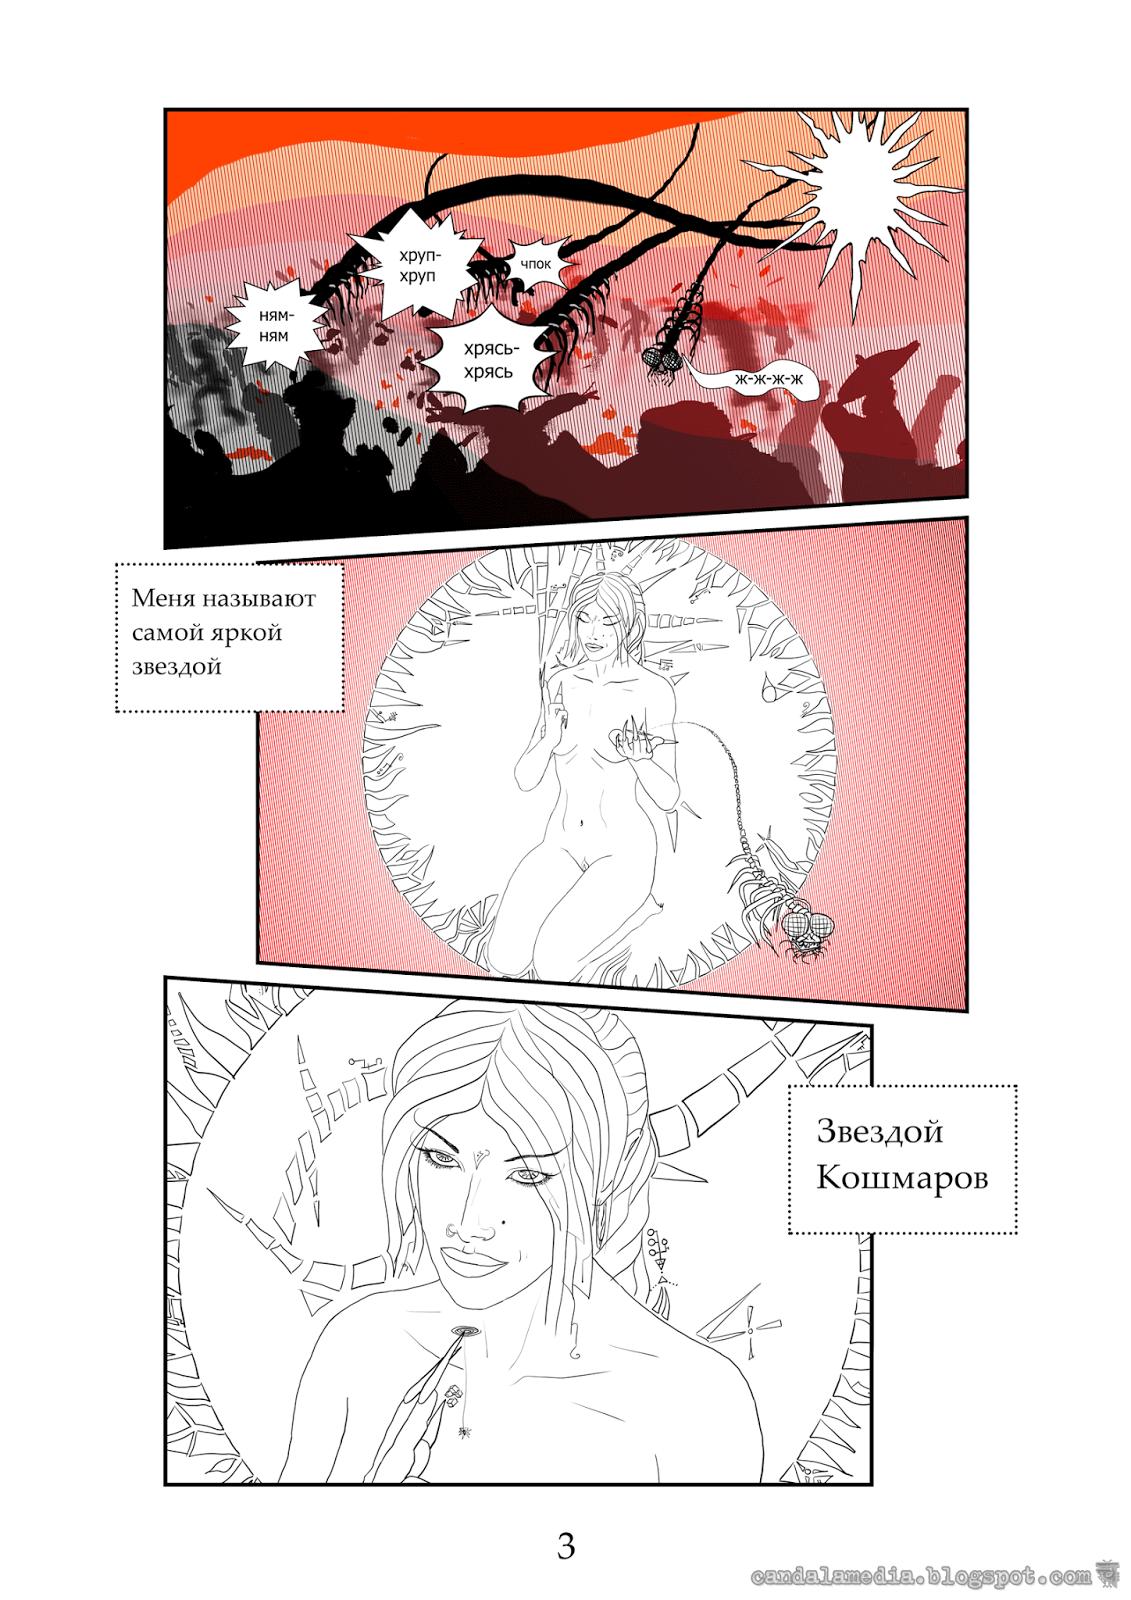 Не ветер - манга (стр. 3)